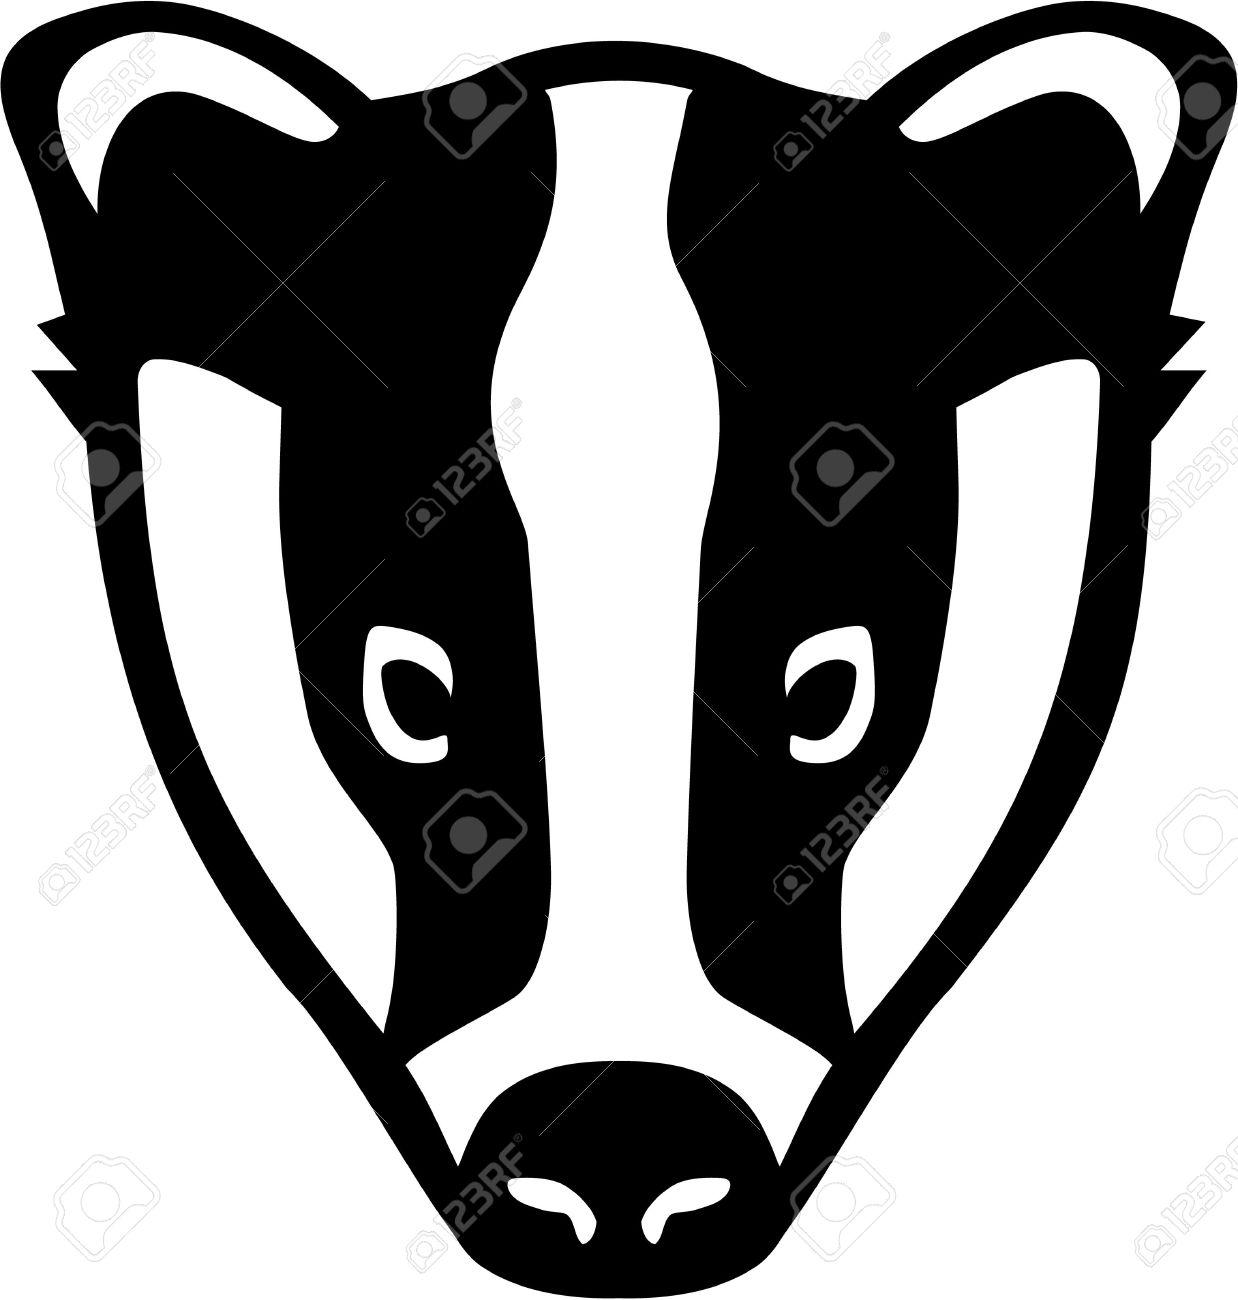 badger: Badger Head